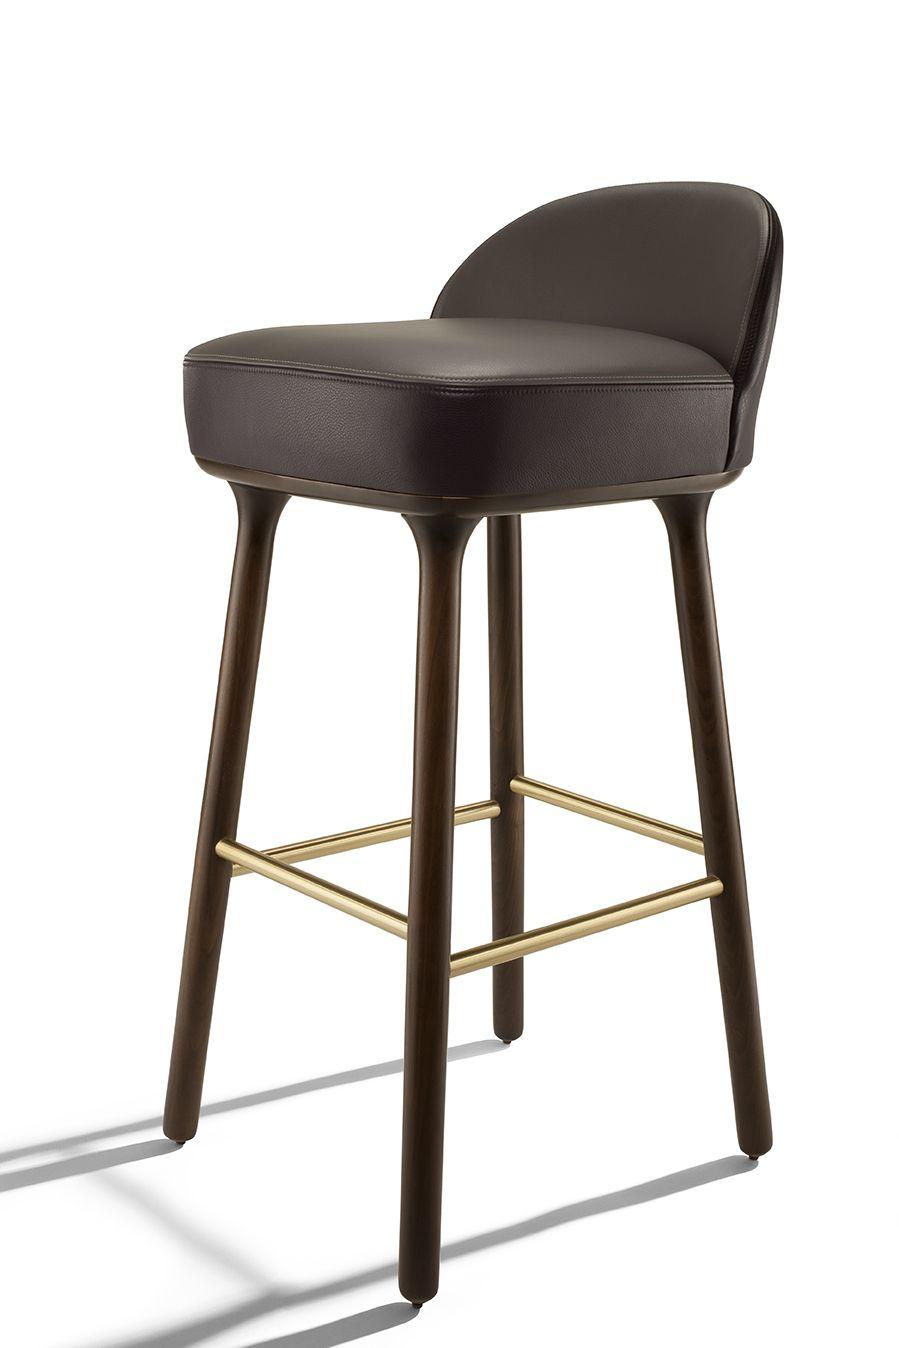 Beetley Bar Stool 现 Bar Stool Chairs Contemporary Bar